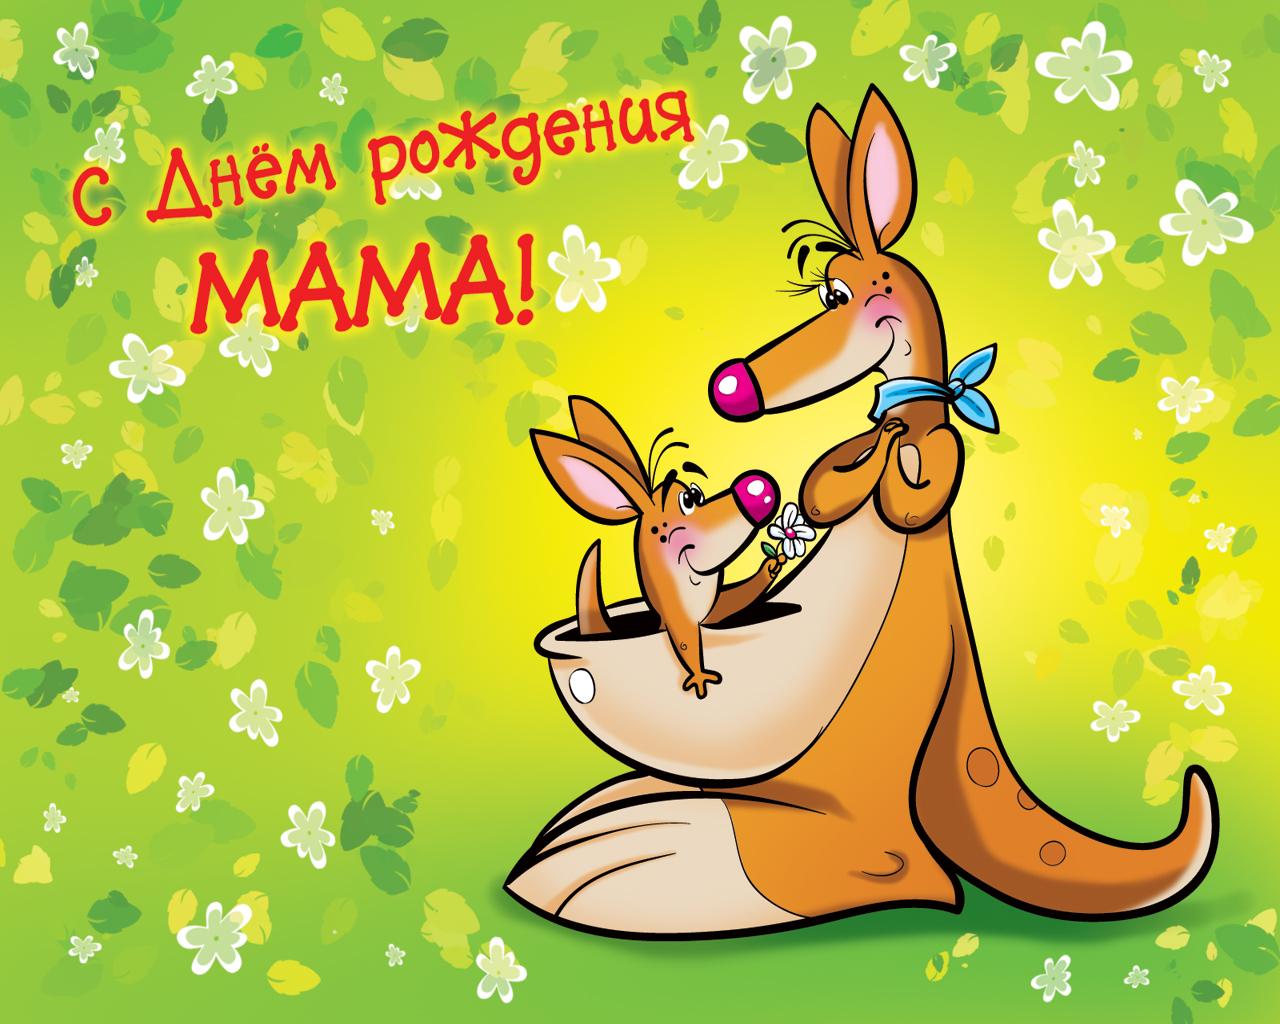 Поздравление с днём рождения маме от дочки картинки